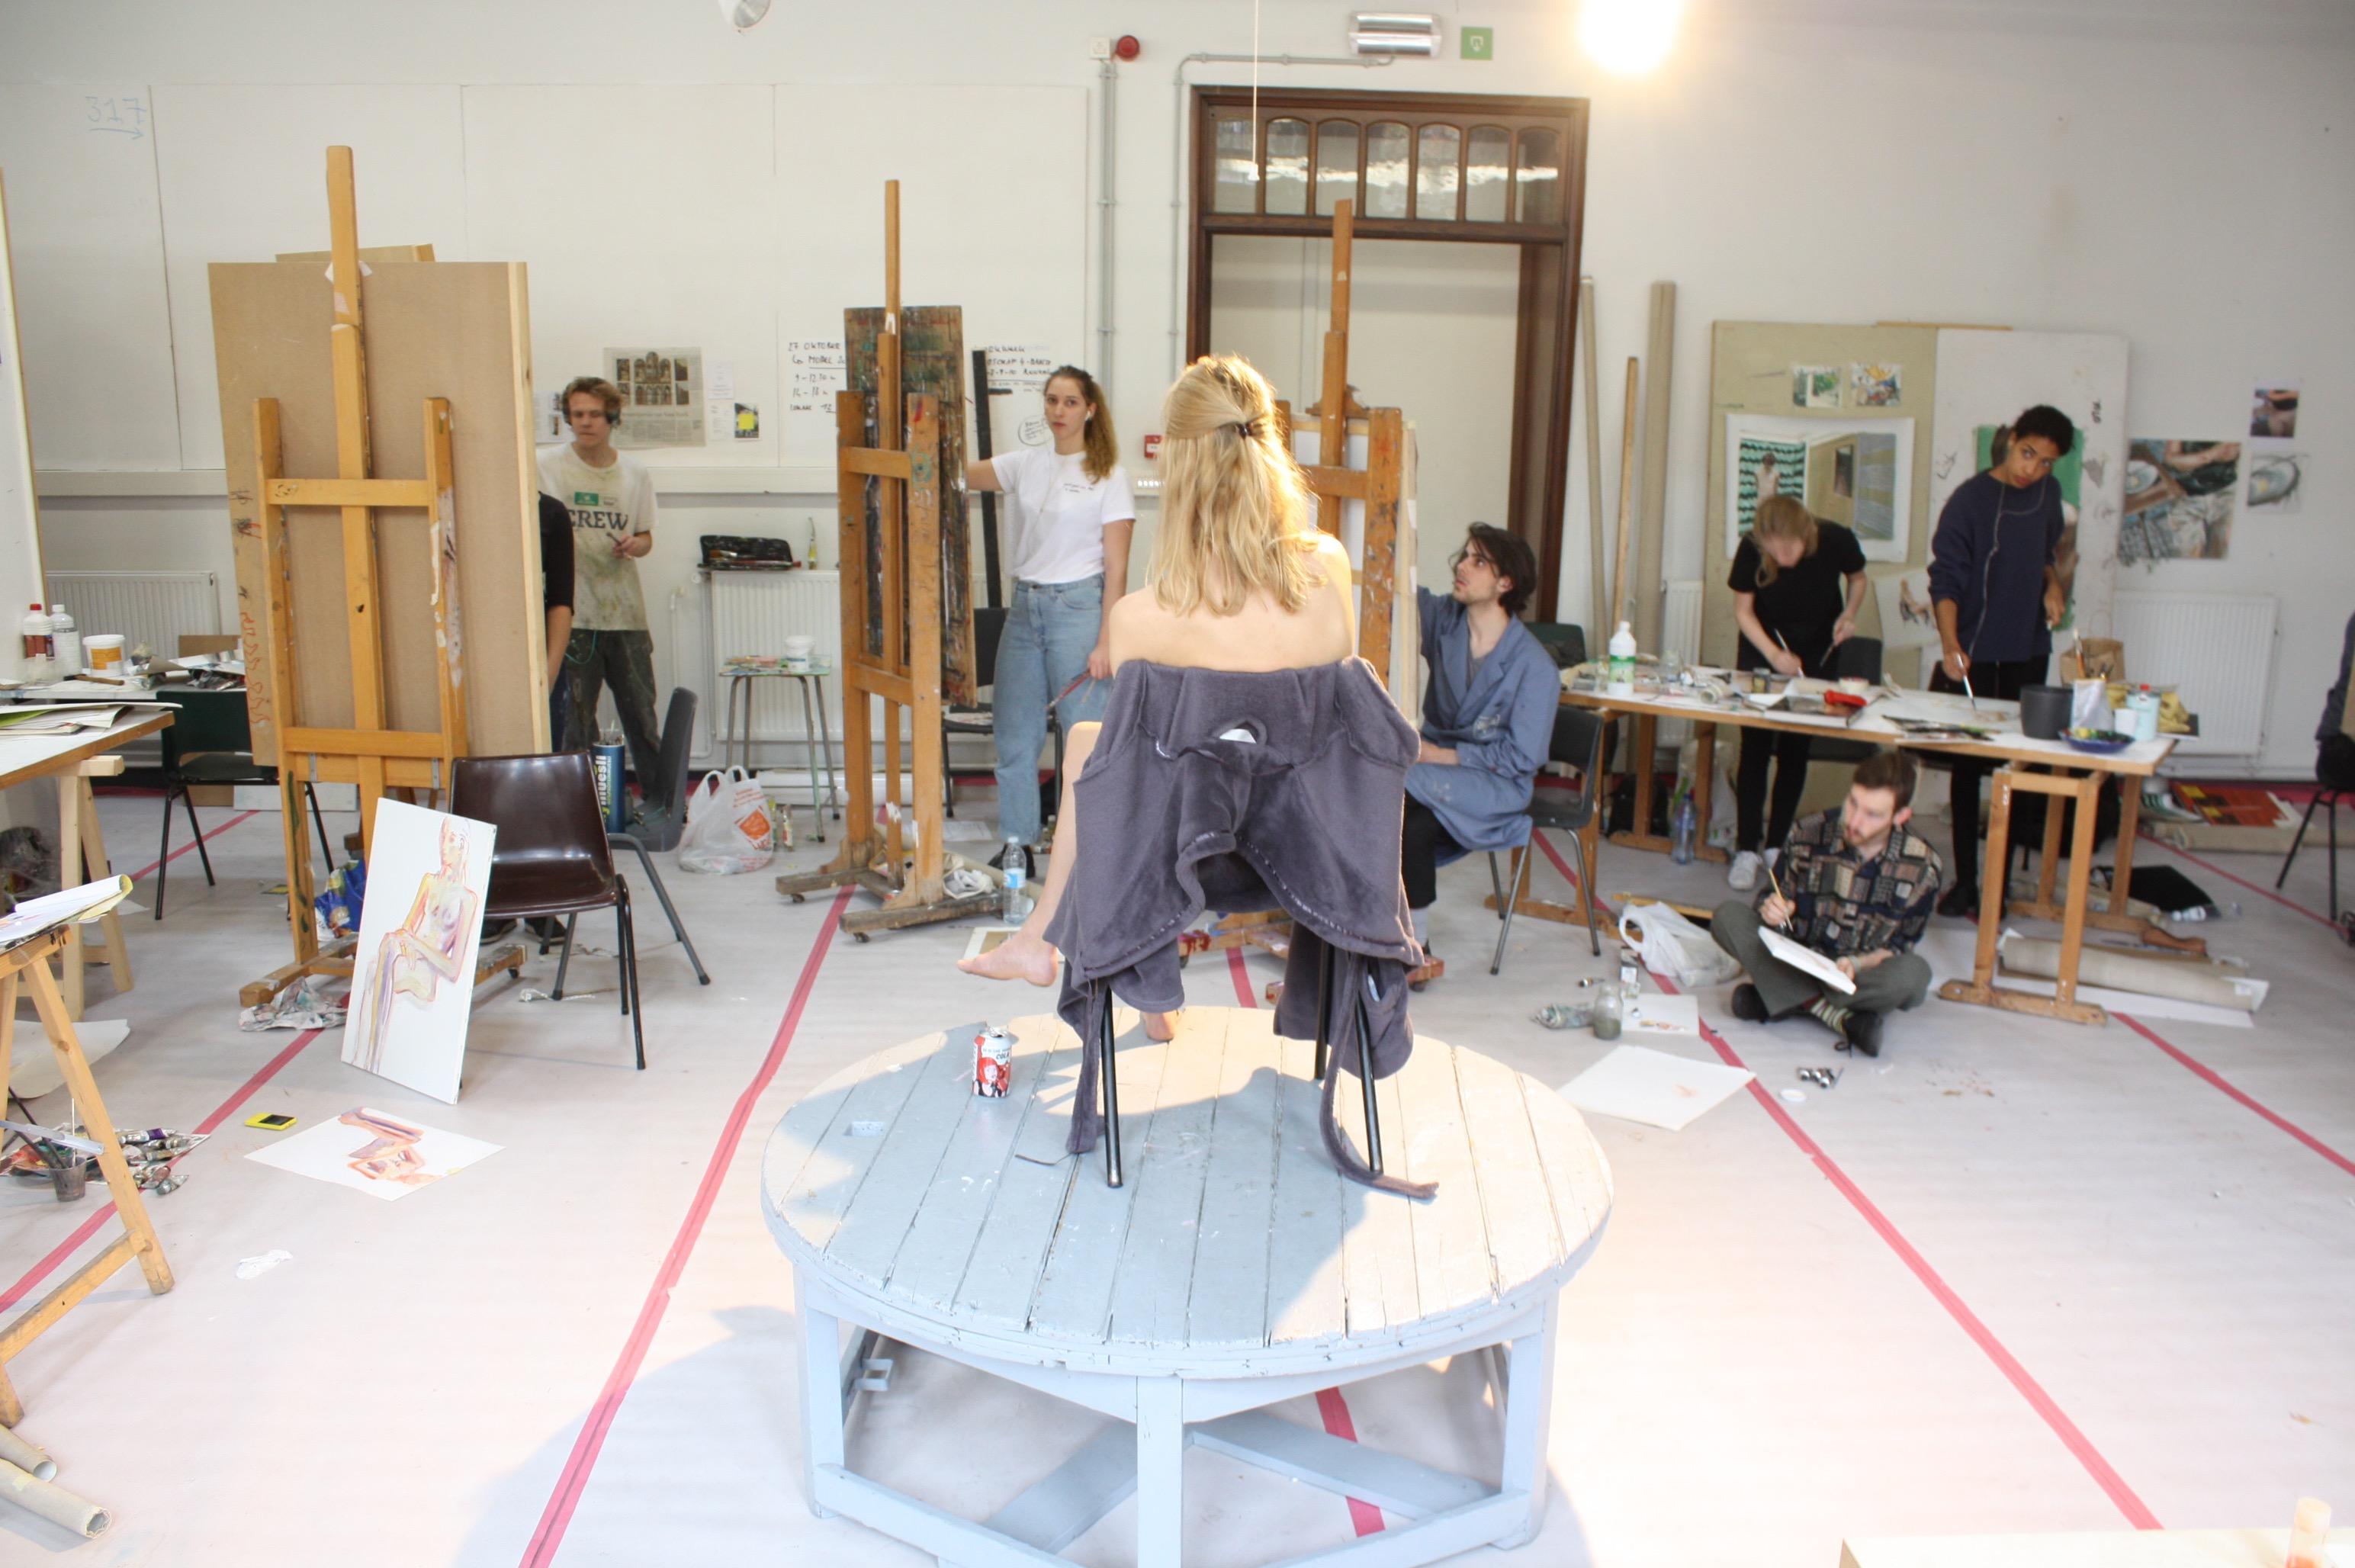 modelschilderes in atelier schilderkunst